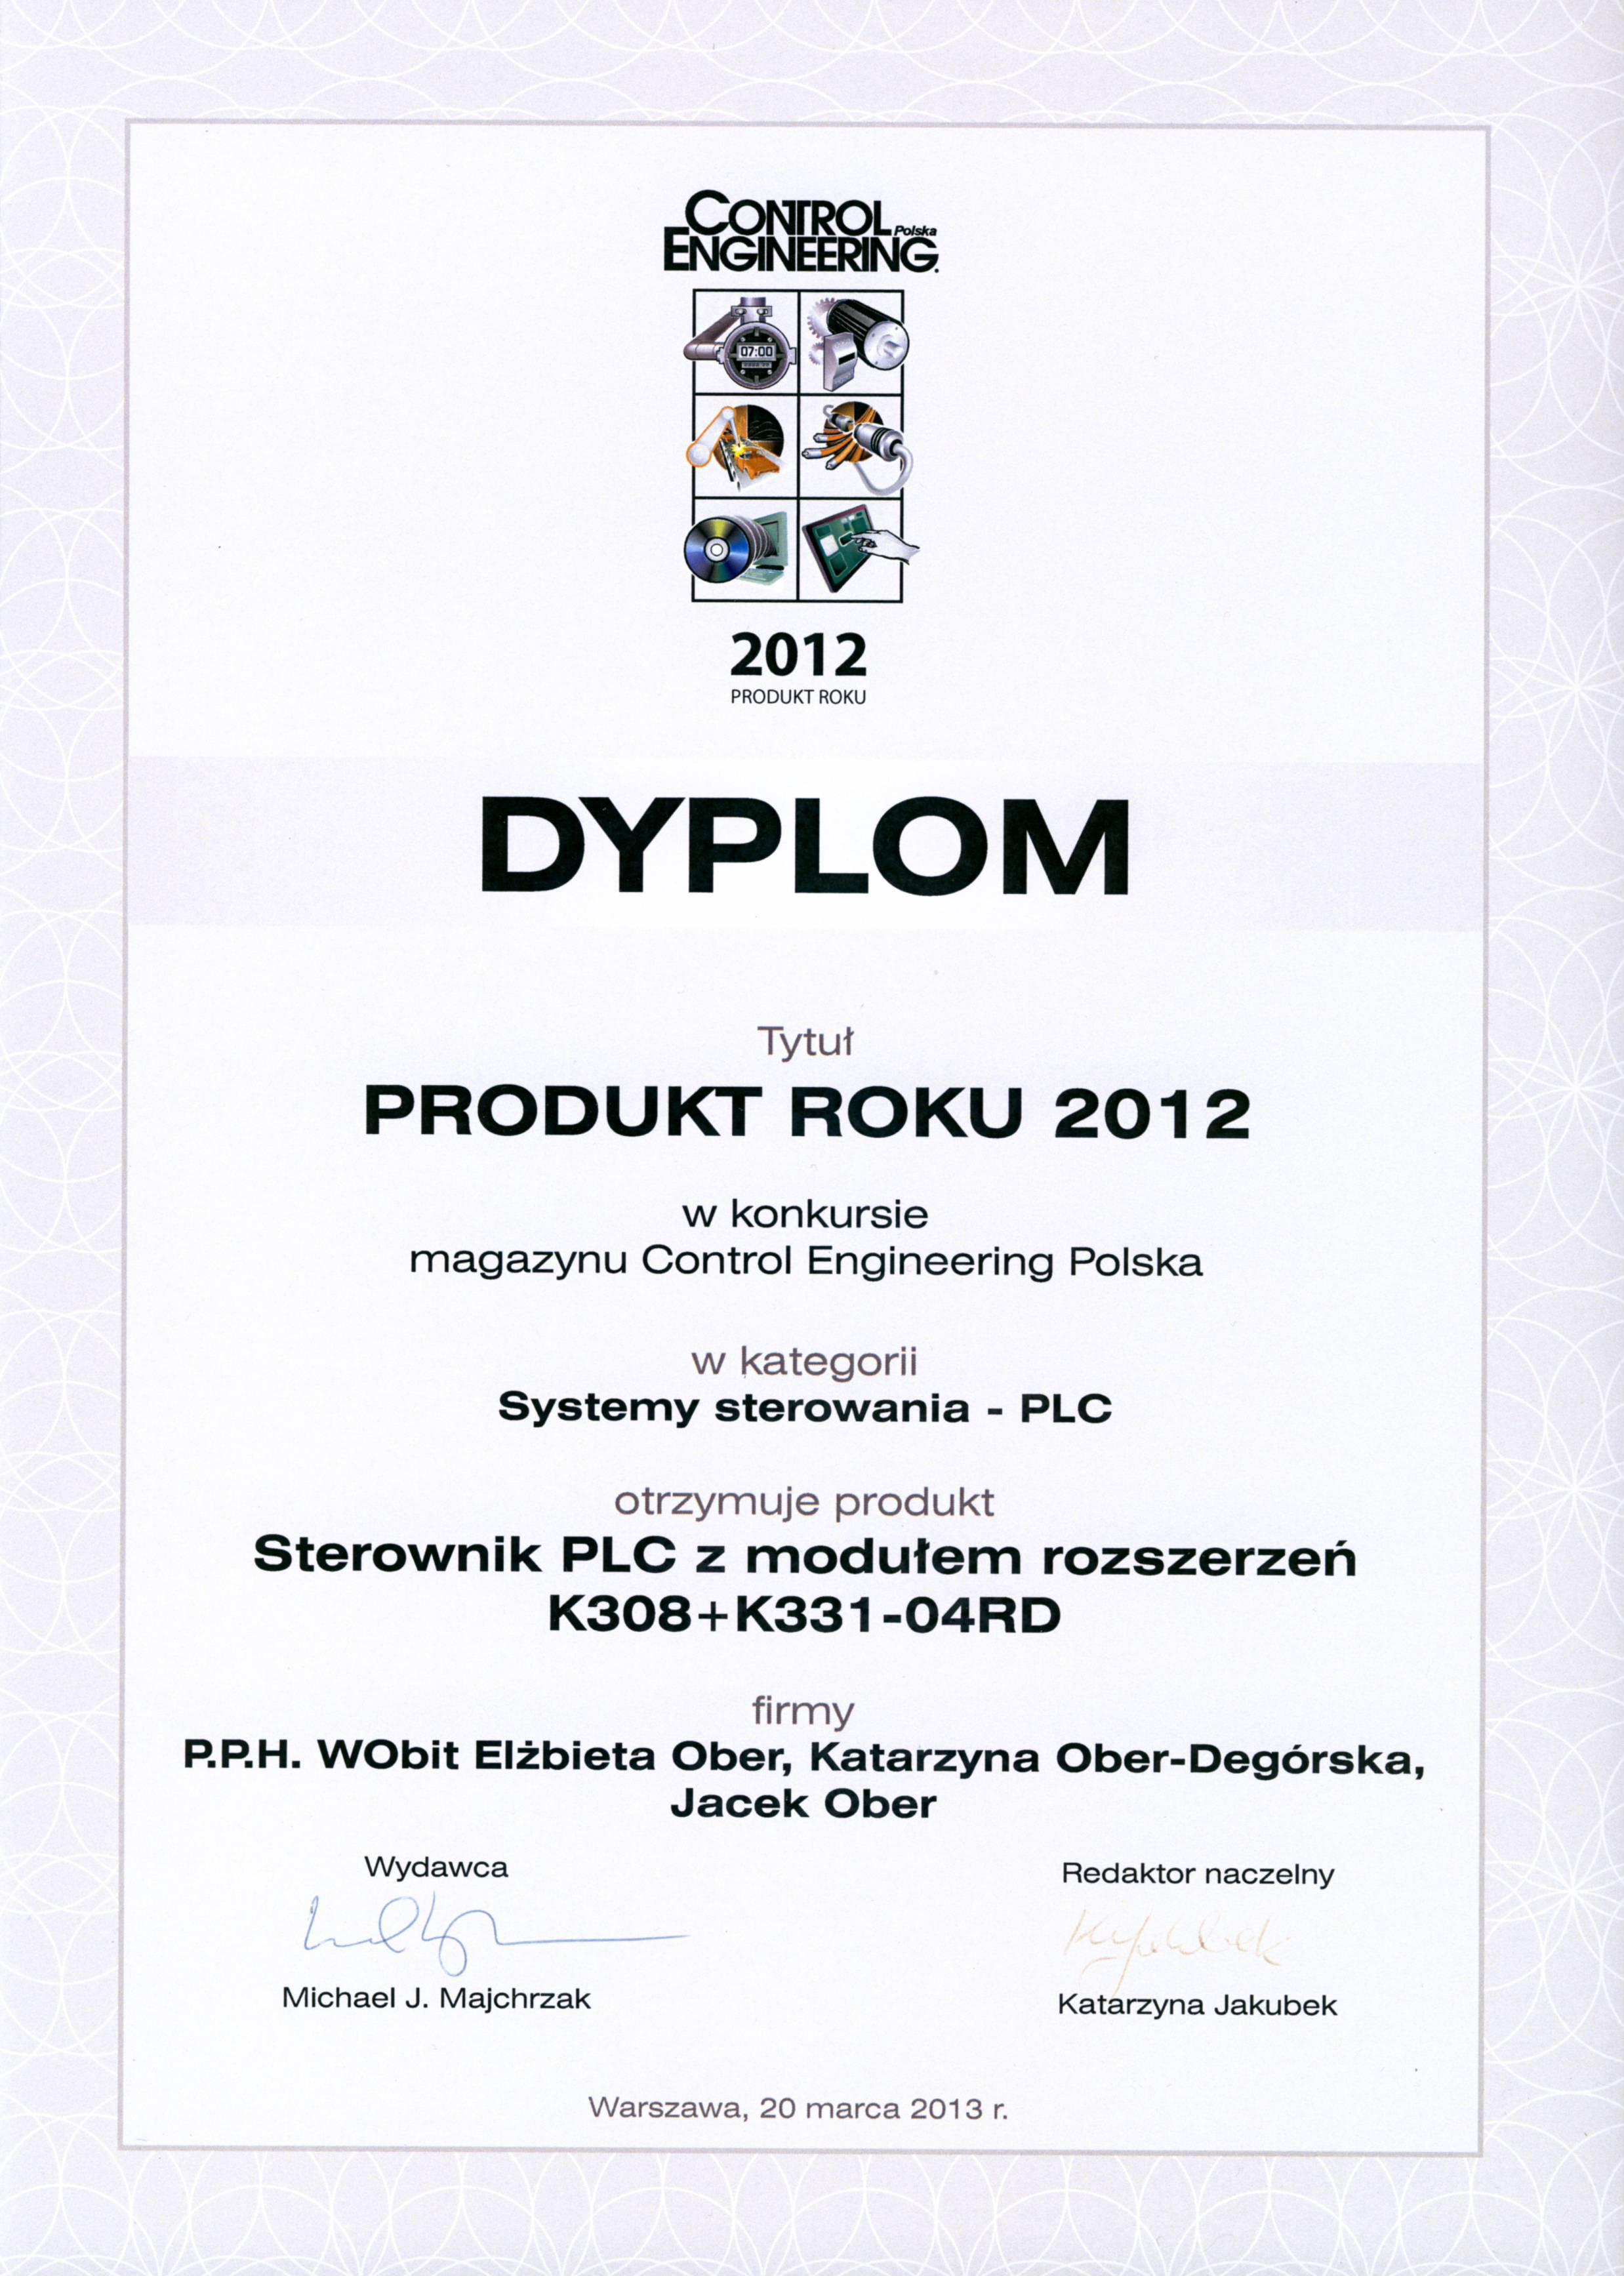 Produkt Roku 2012 - Sterownik programowalny K308+K331-04RD